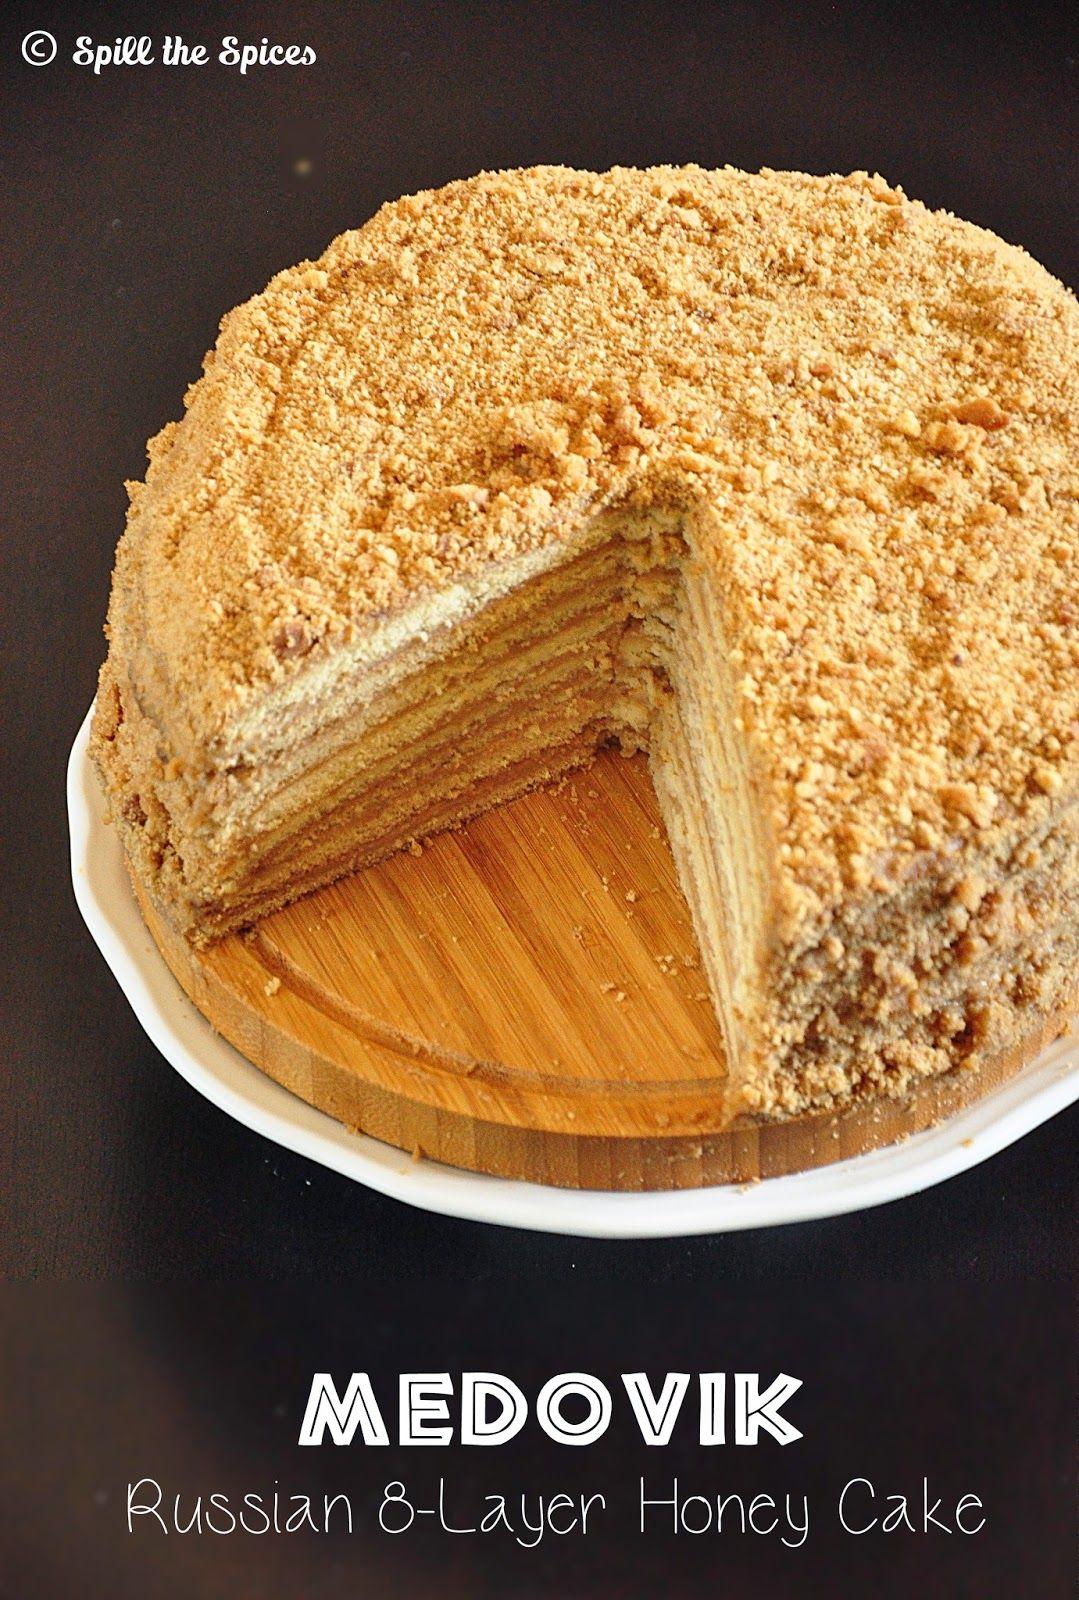 medovik - russian 8-layer honey cake with creamy caramel filling #honeycake